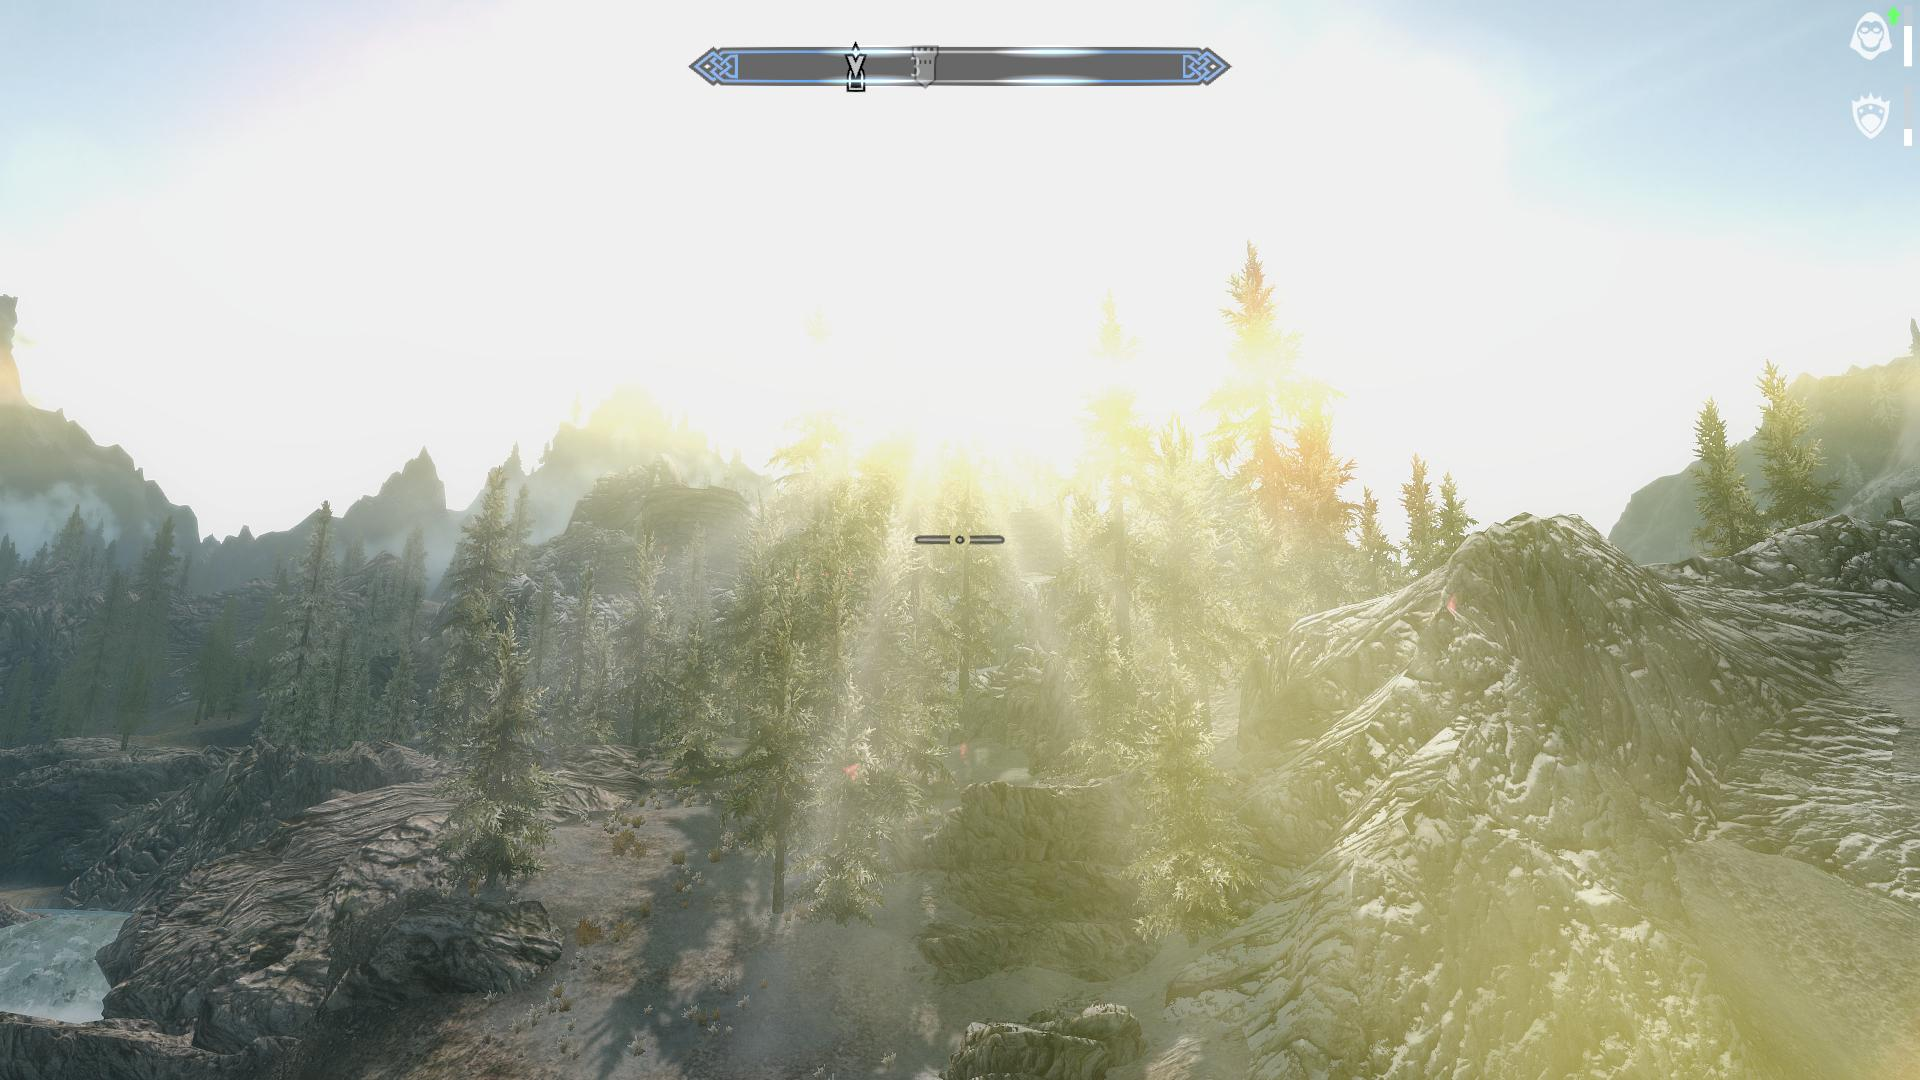 000210.Jpg - Elder Scrolls 5: Skyrim, the